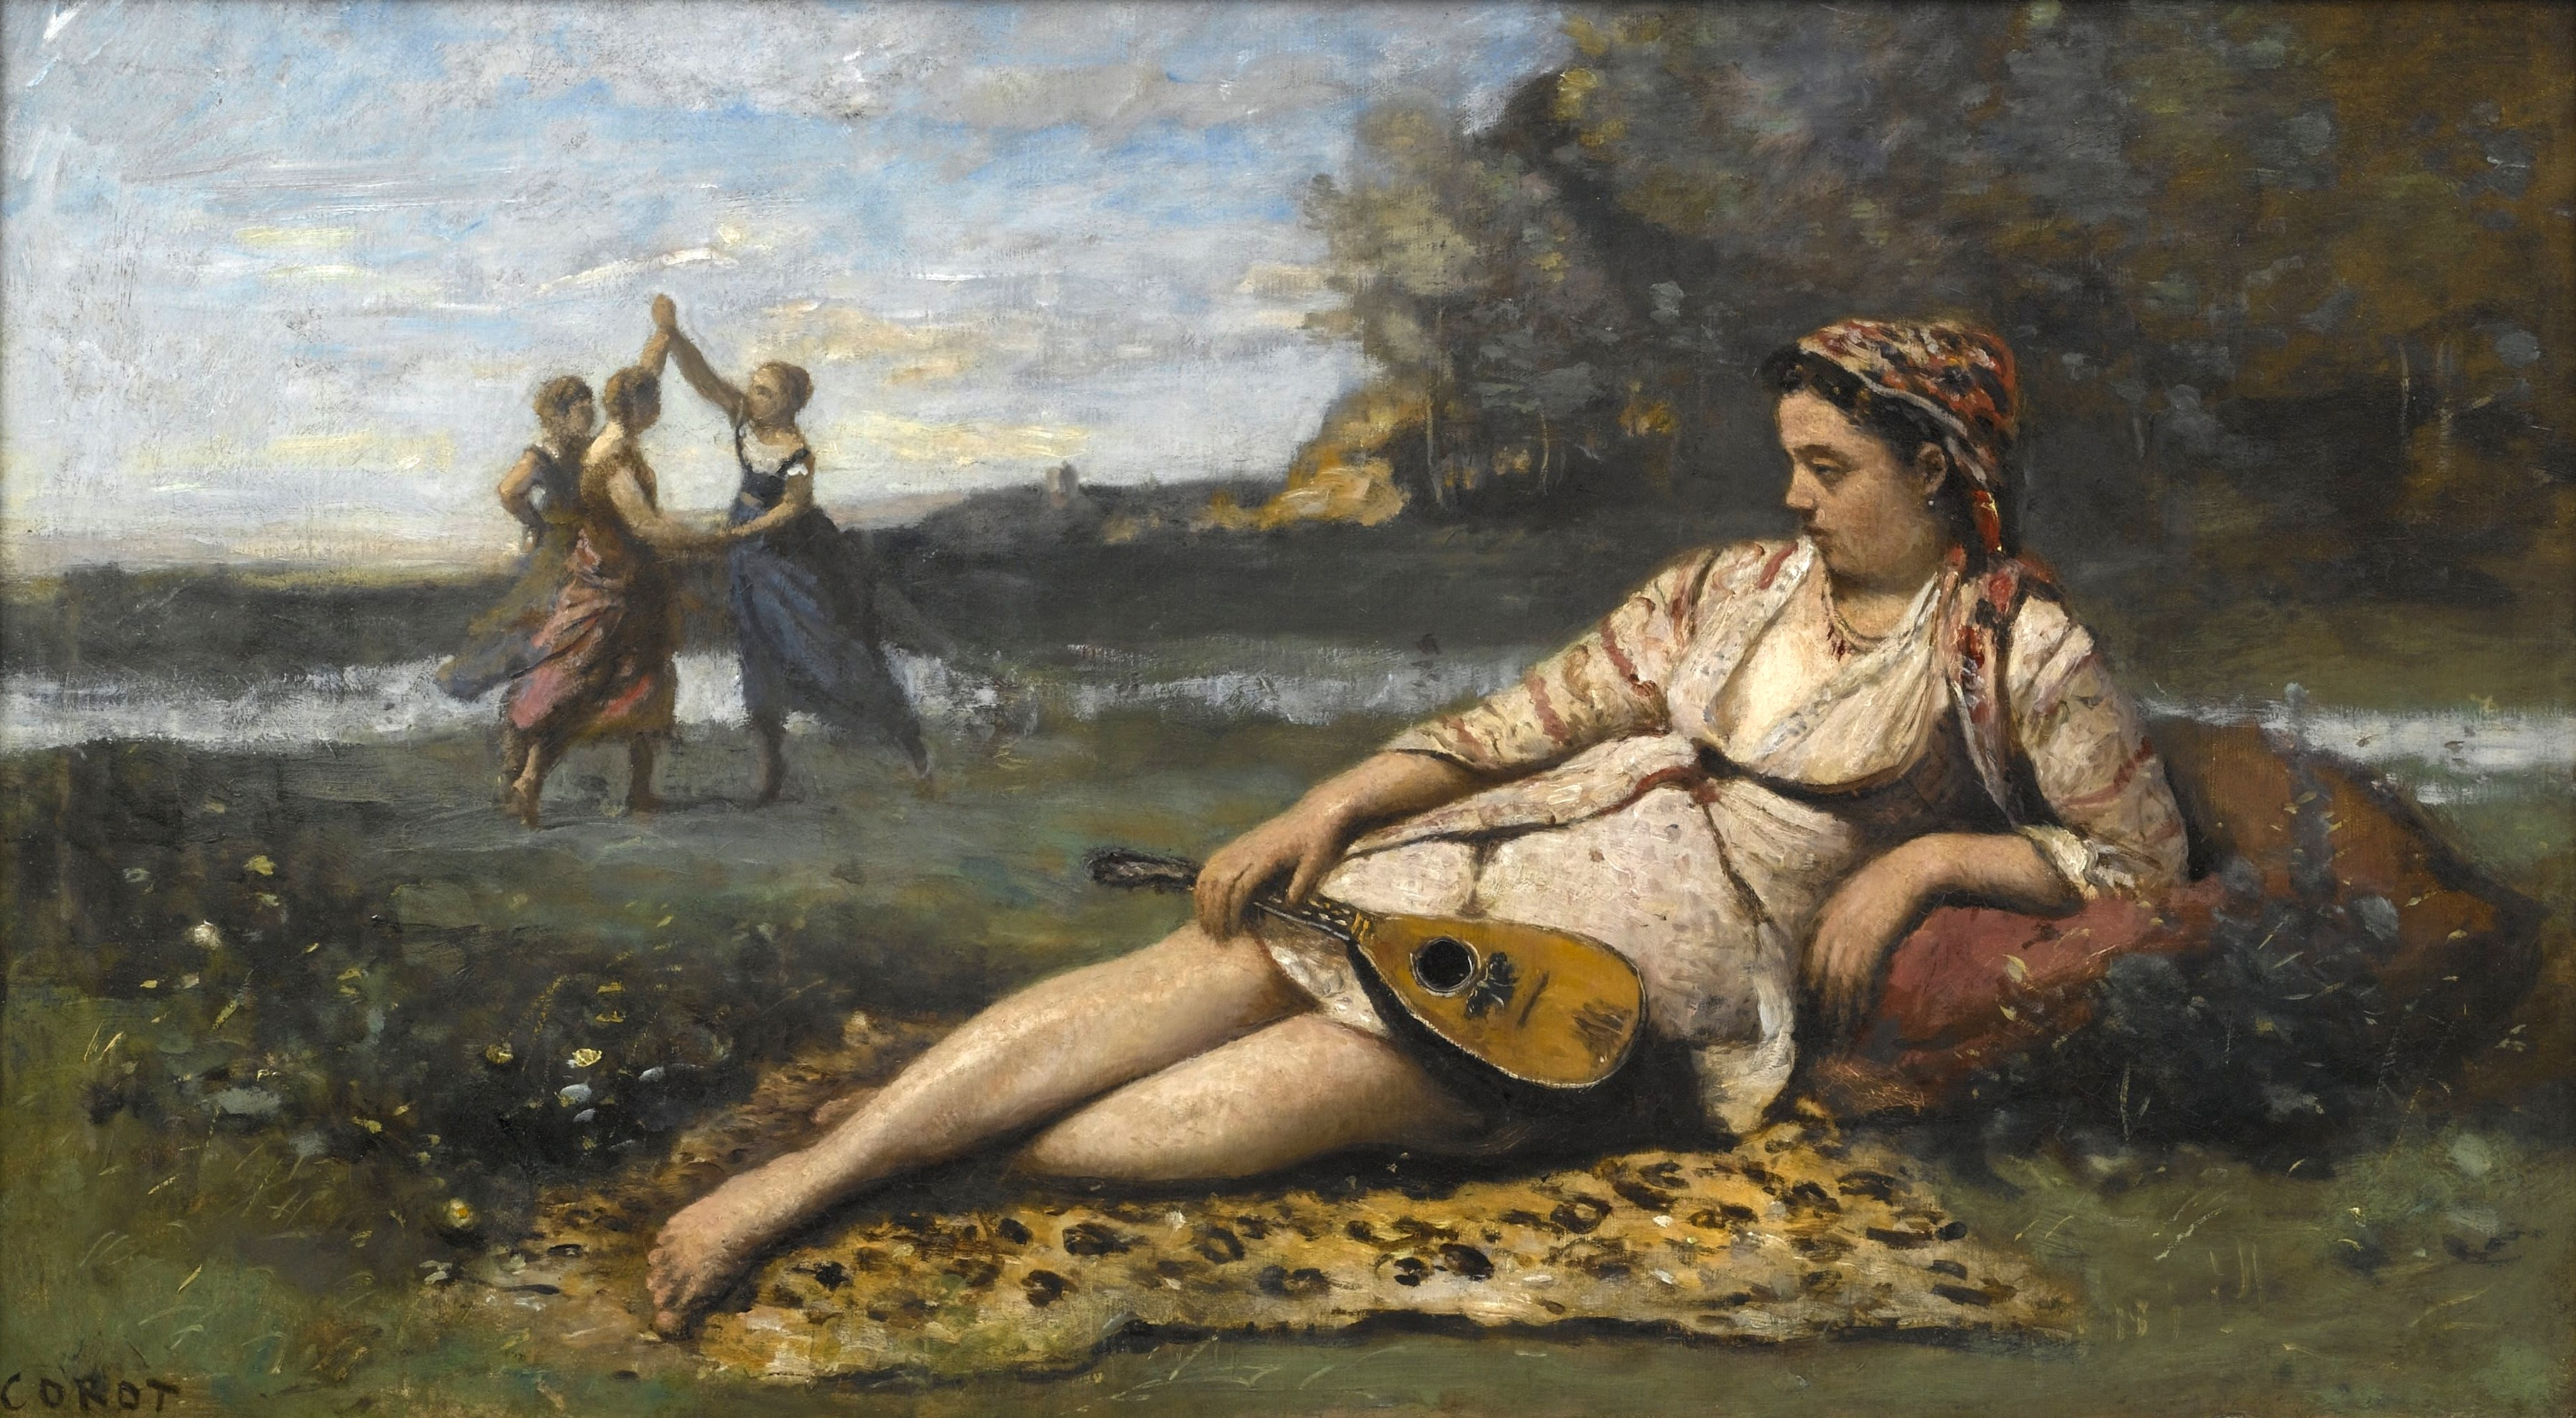 Jean-Baptiste-Camille_Corot_-_Young_Women_of_Sparta_%28Jeunes_filles_de_Sparte%29_-_Google_Art_Project.jpg